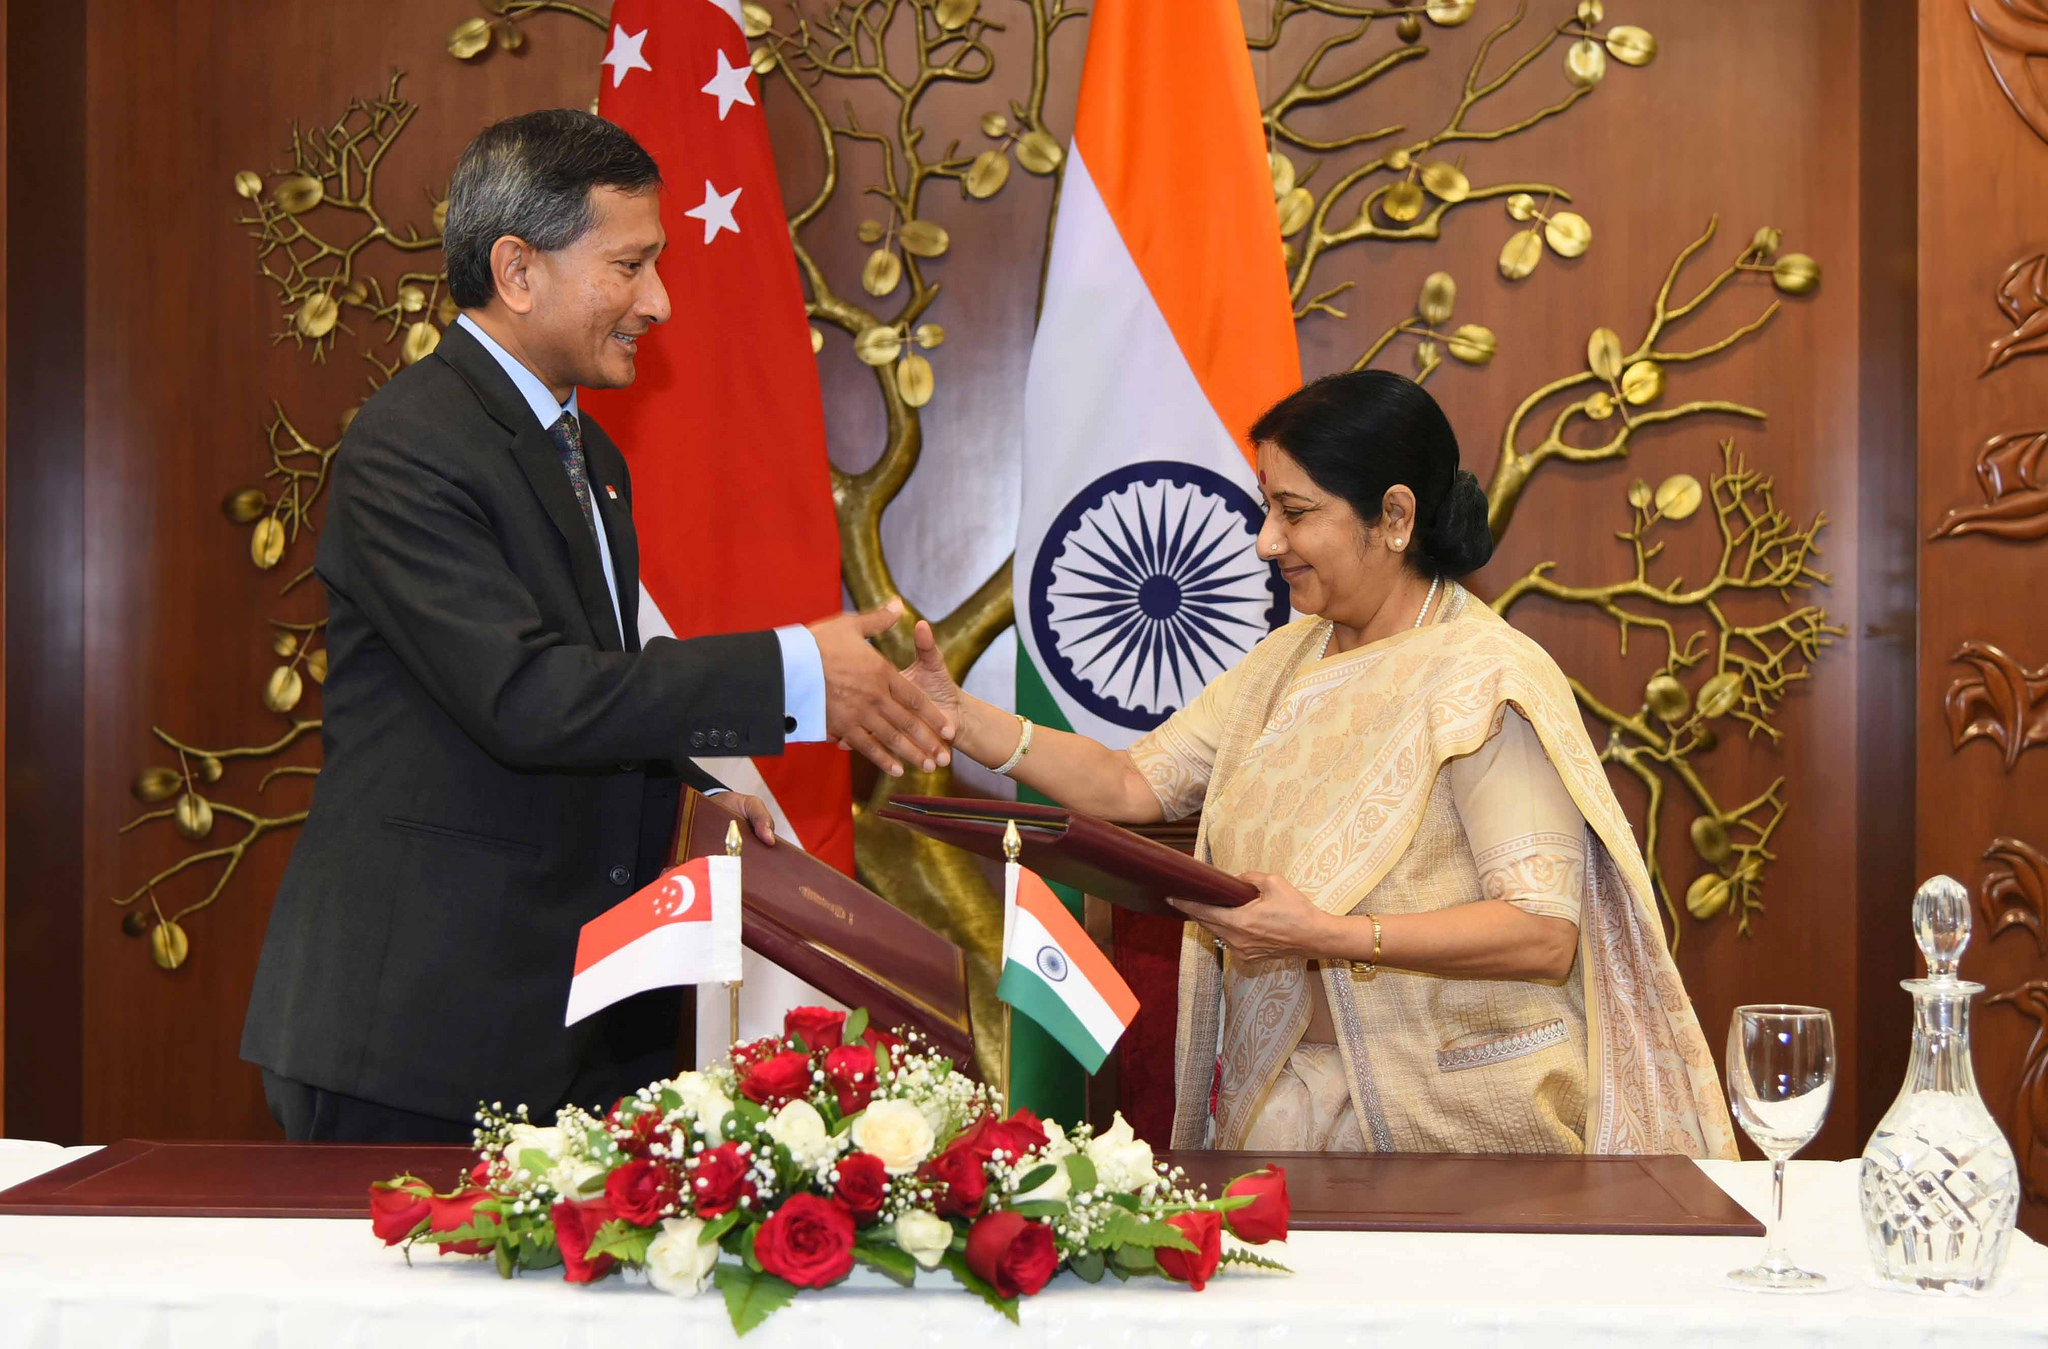 Sushma Swaraj with Dr. Vivian Balakrishnan, Singapore's Minister for Foreign Affairs on 12 October 2015 Photo courtesy: Press Information Bureau/MEA